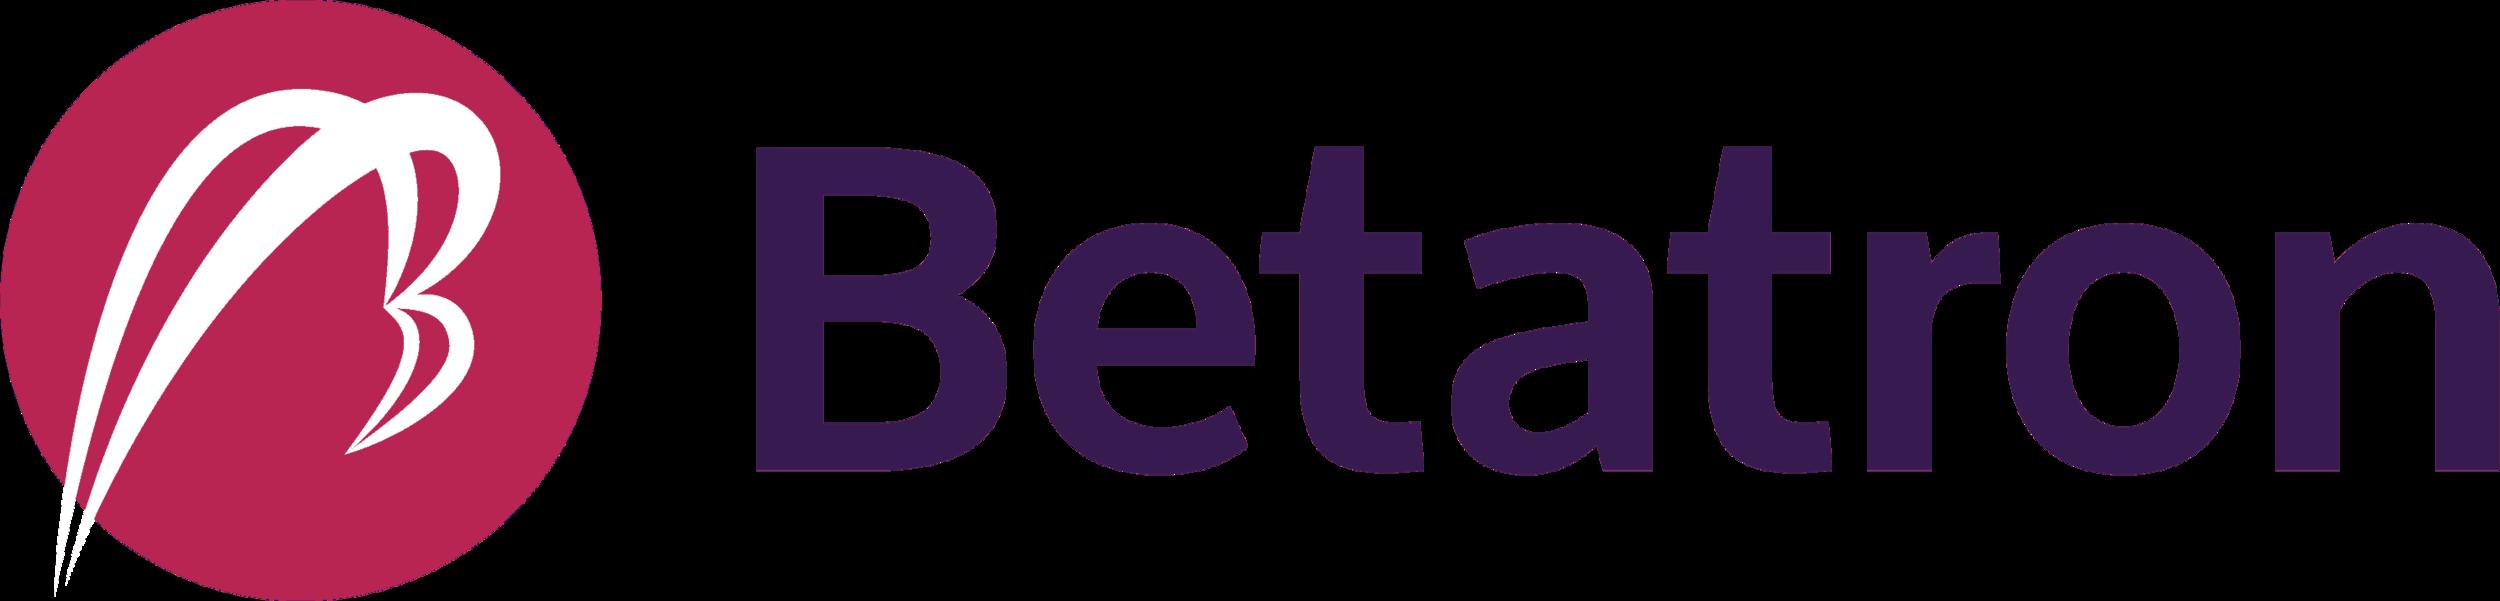 Betatron Logo.png